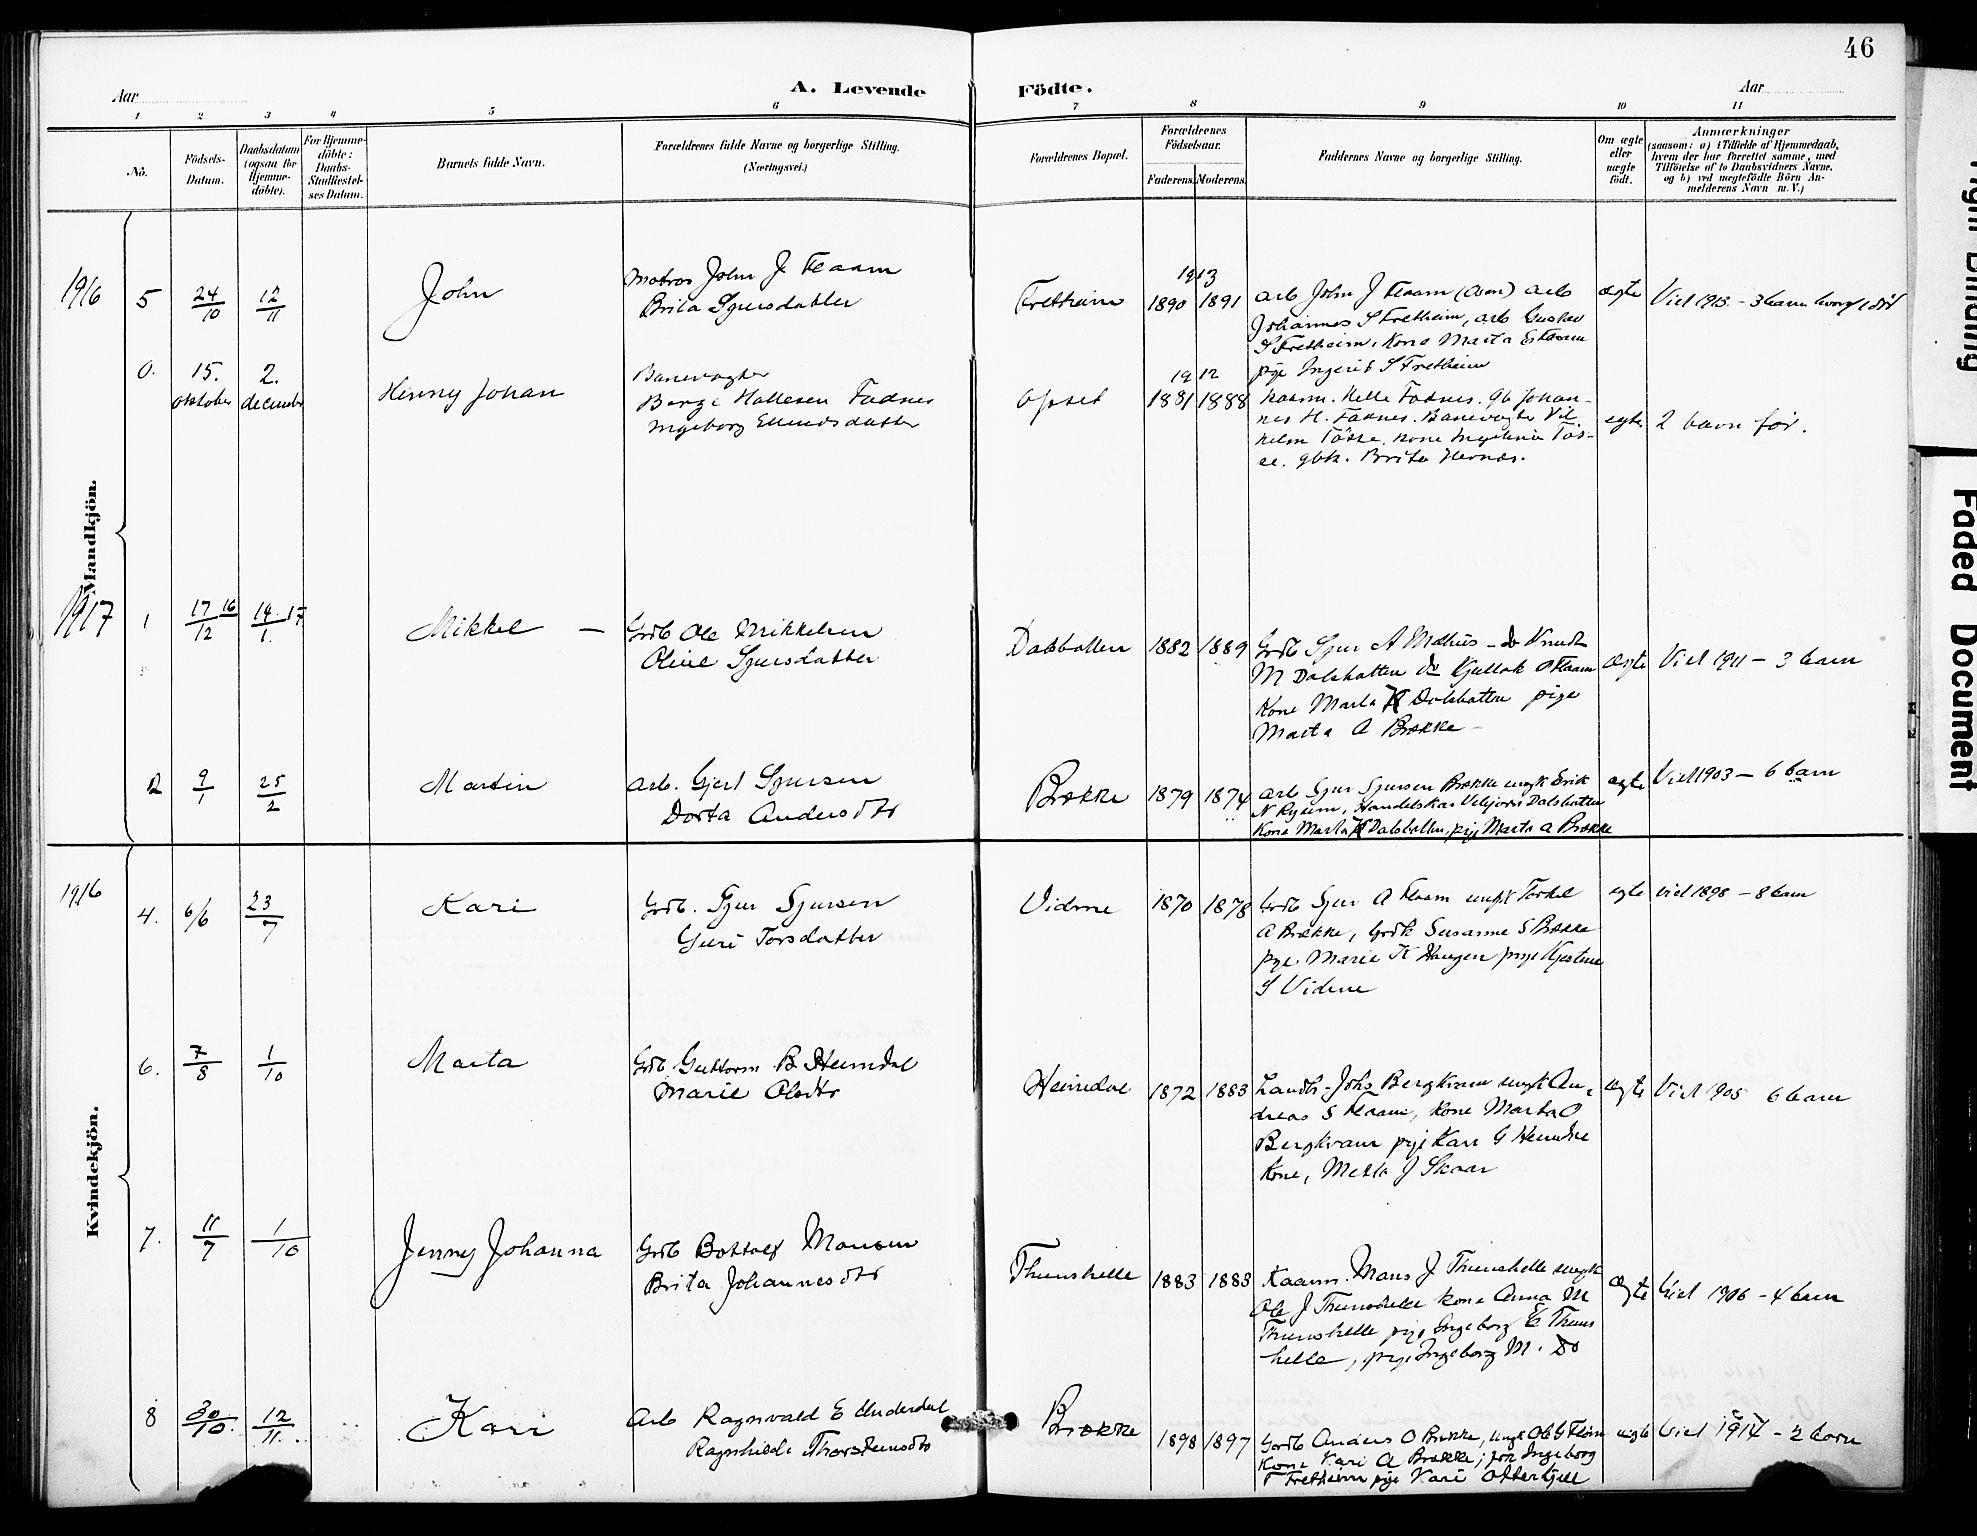 SAB, Aurland Sokneprestembete*, Klokkerbok nr. B 2, 1887-1929, s. 46